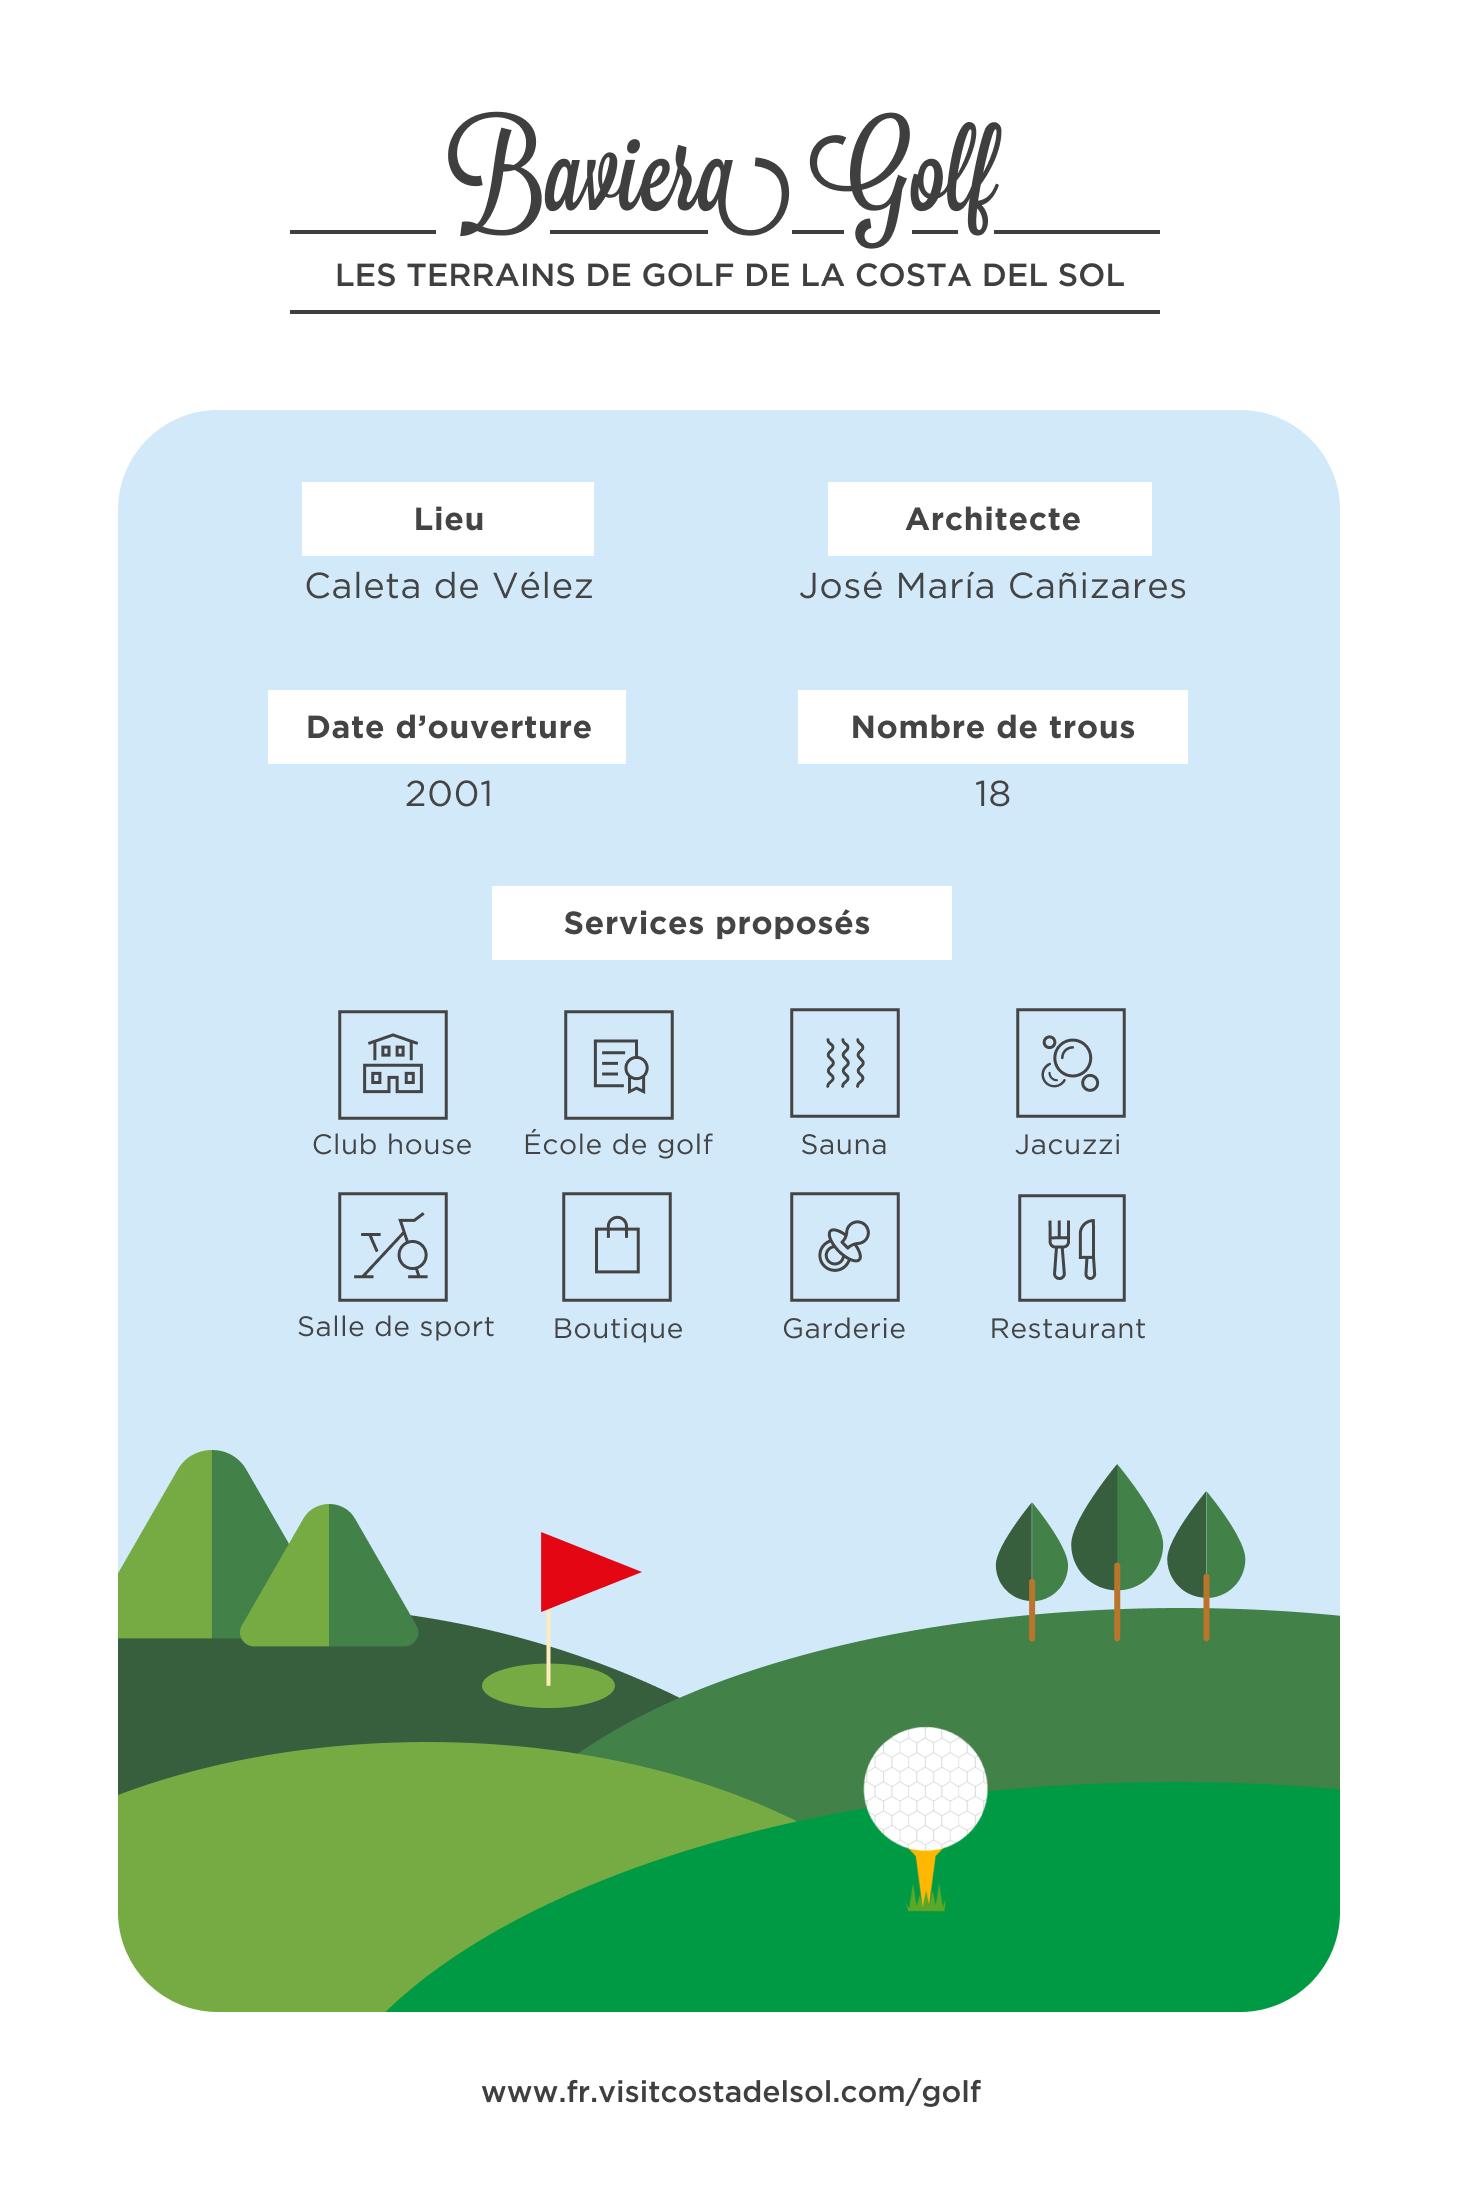 csol_#13_infografia_golf_baviera-FR